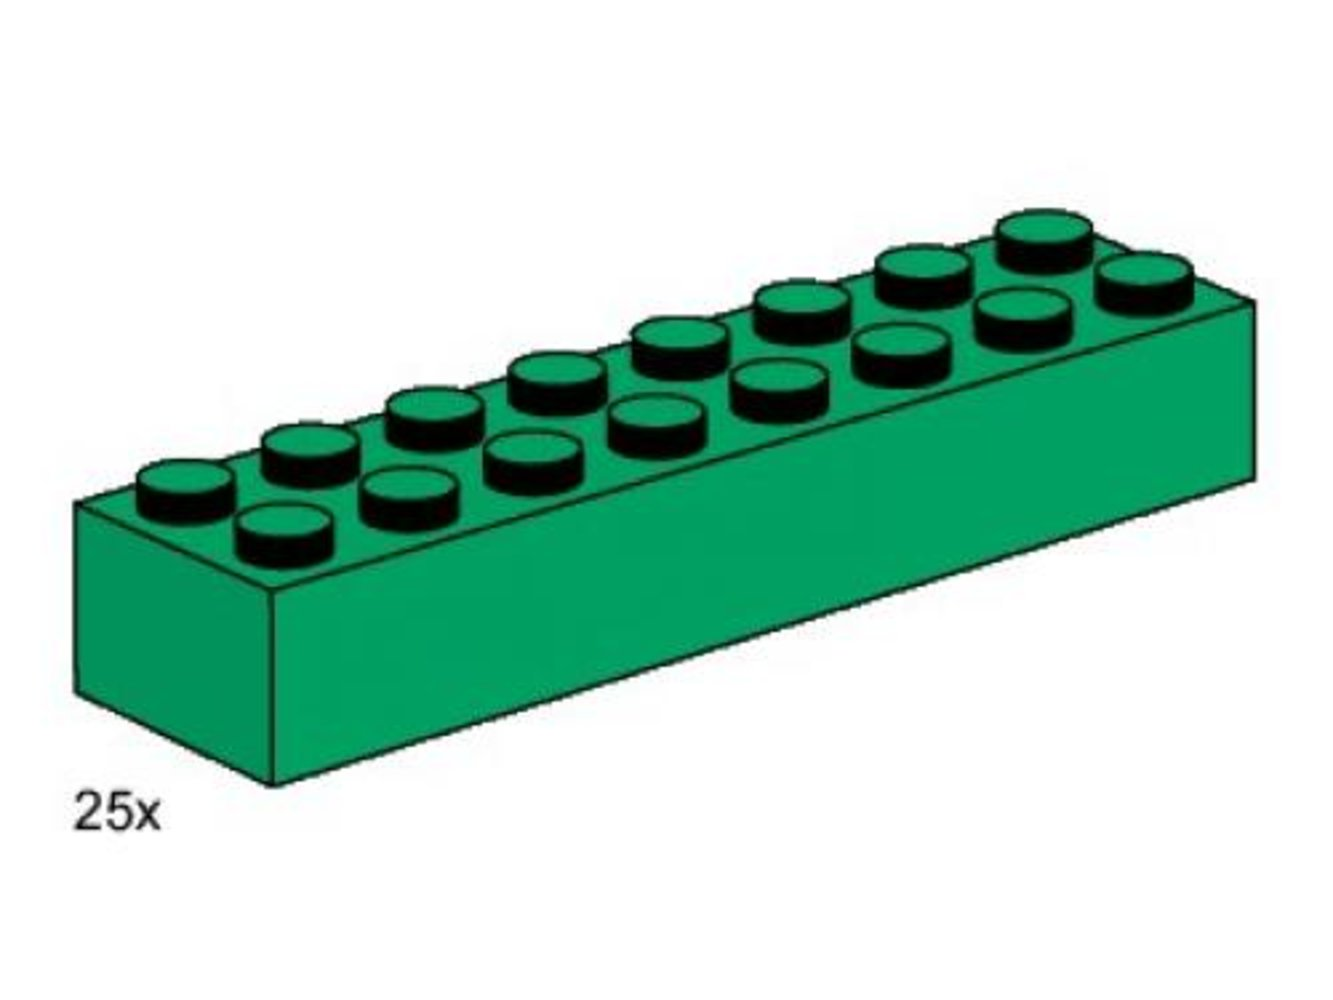 2 x 8 Dark Green Bricks